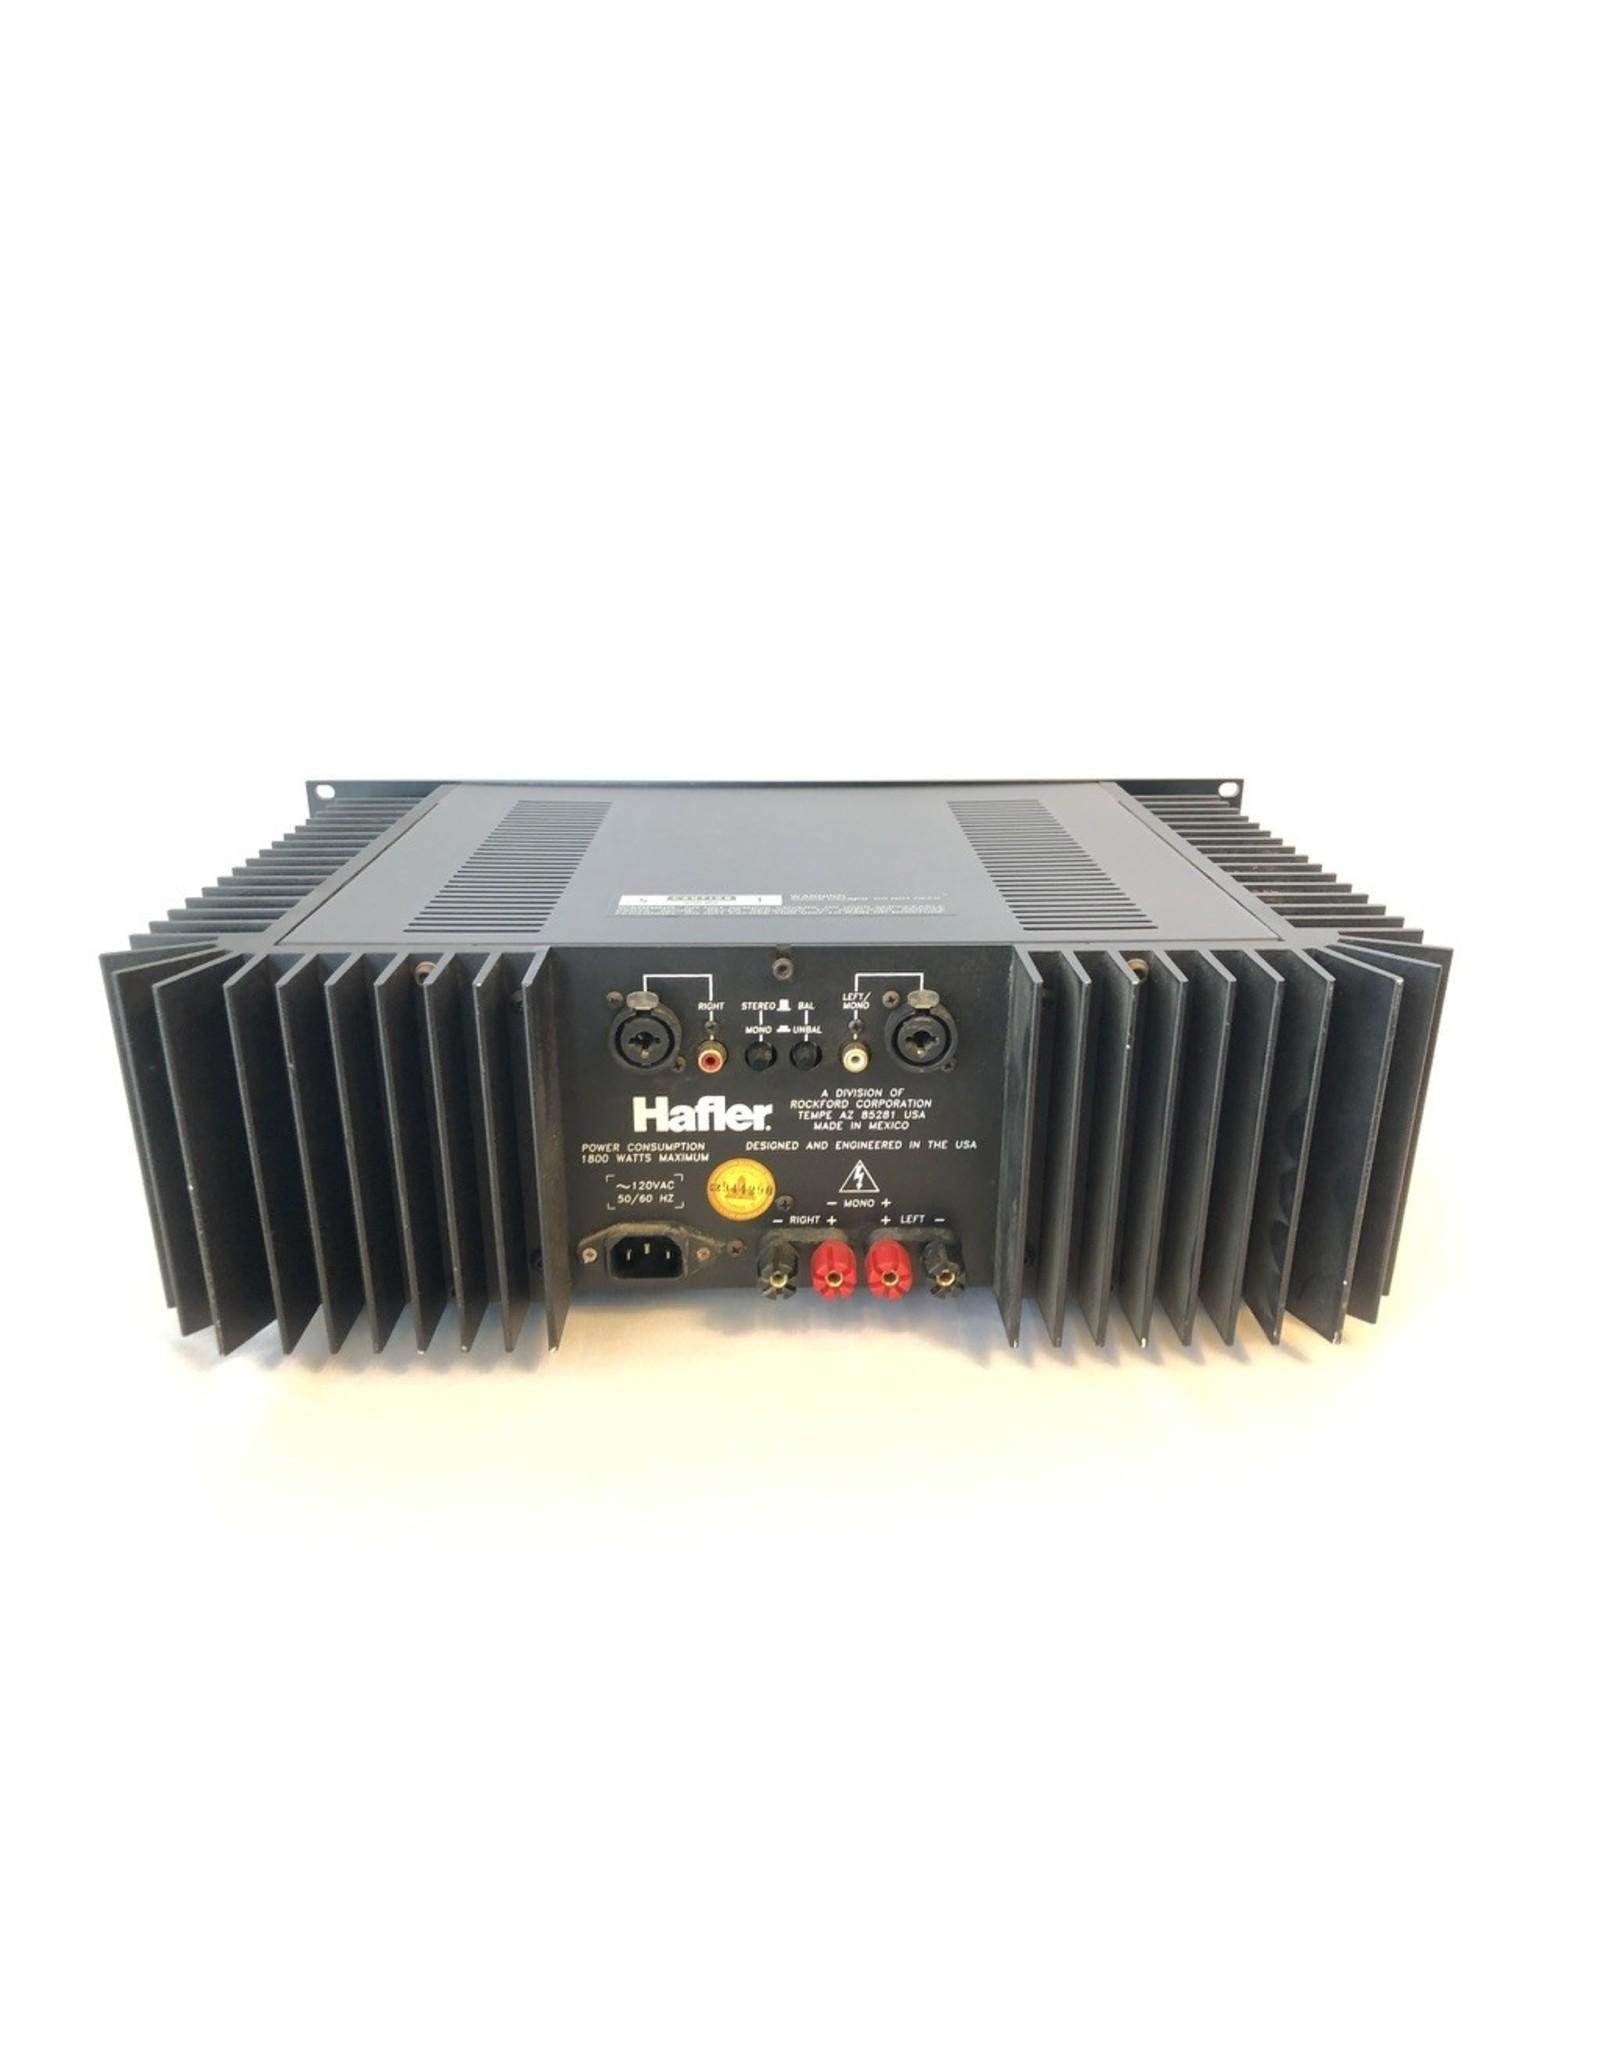 Hafler Hafler 9505 Power Amp USED